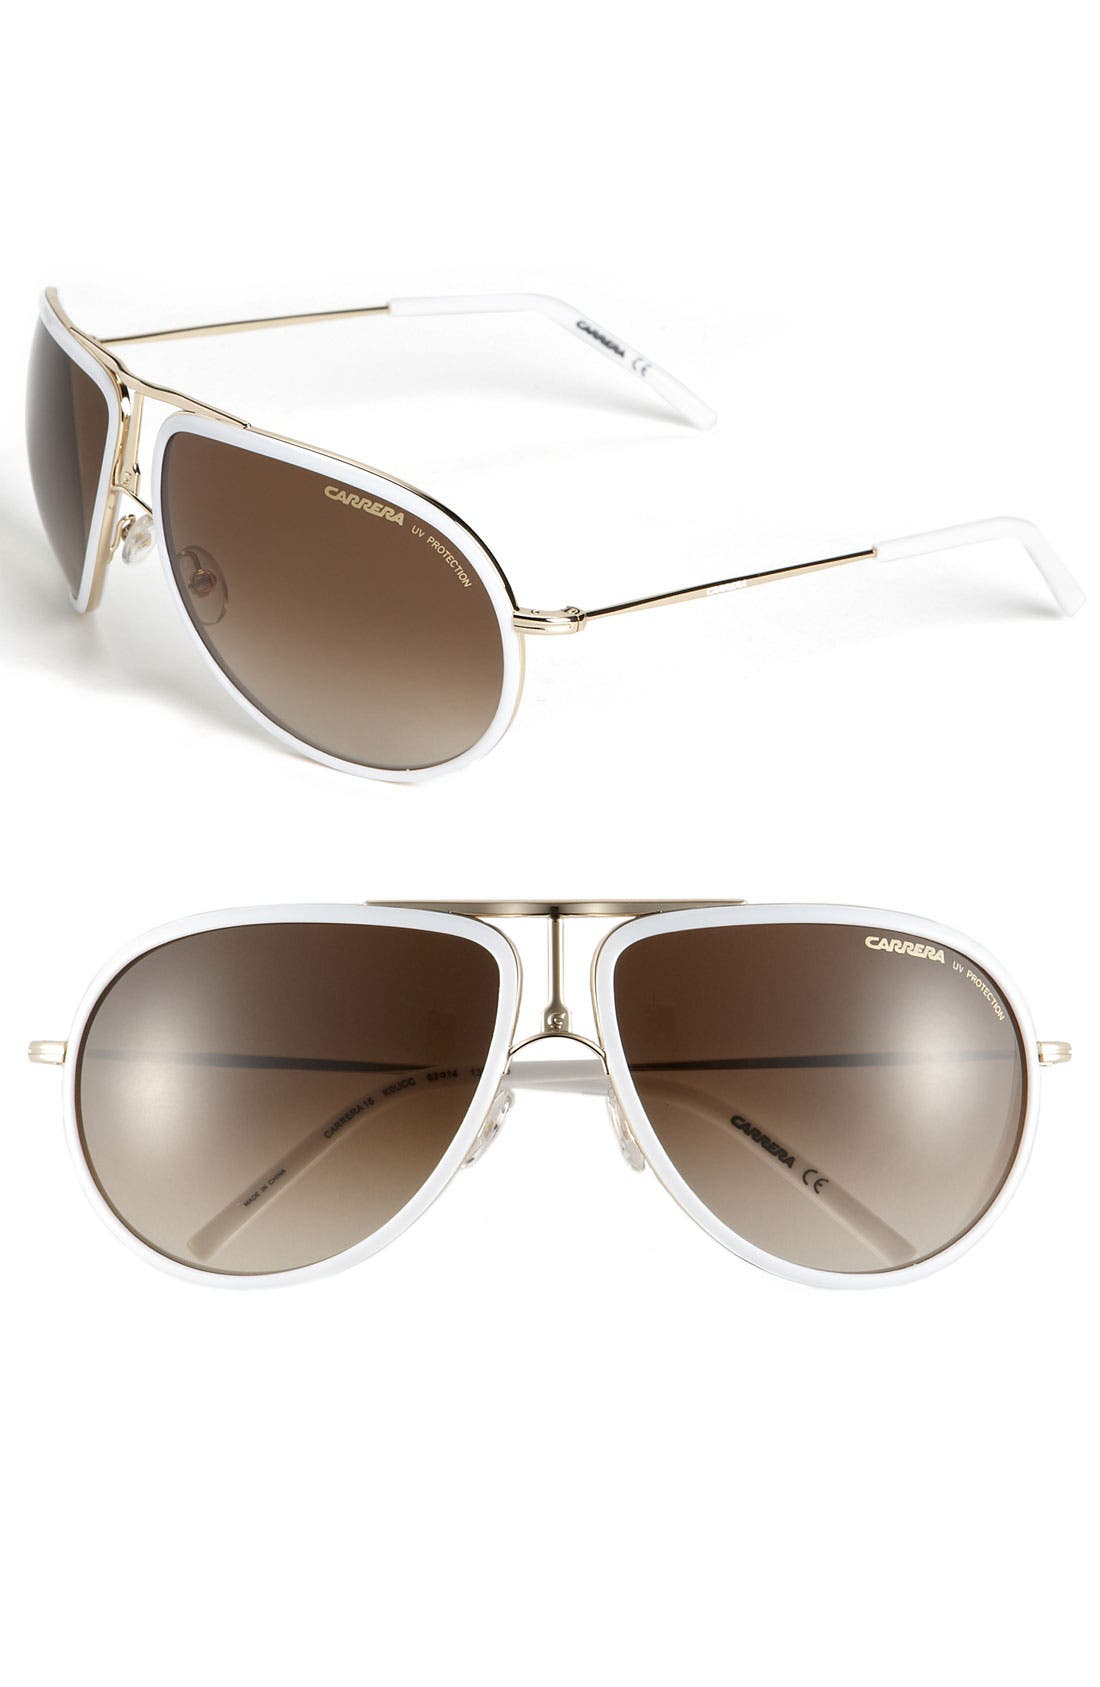 Alternate Image 1 Selected - Carrera Eyewear 63mm Metal Aviator Sunglasses